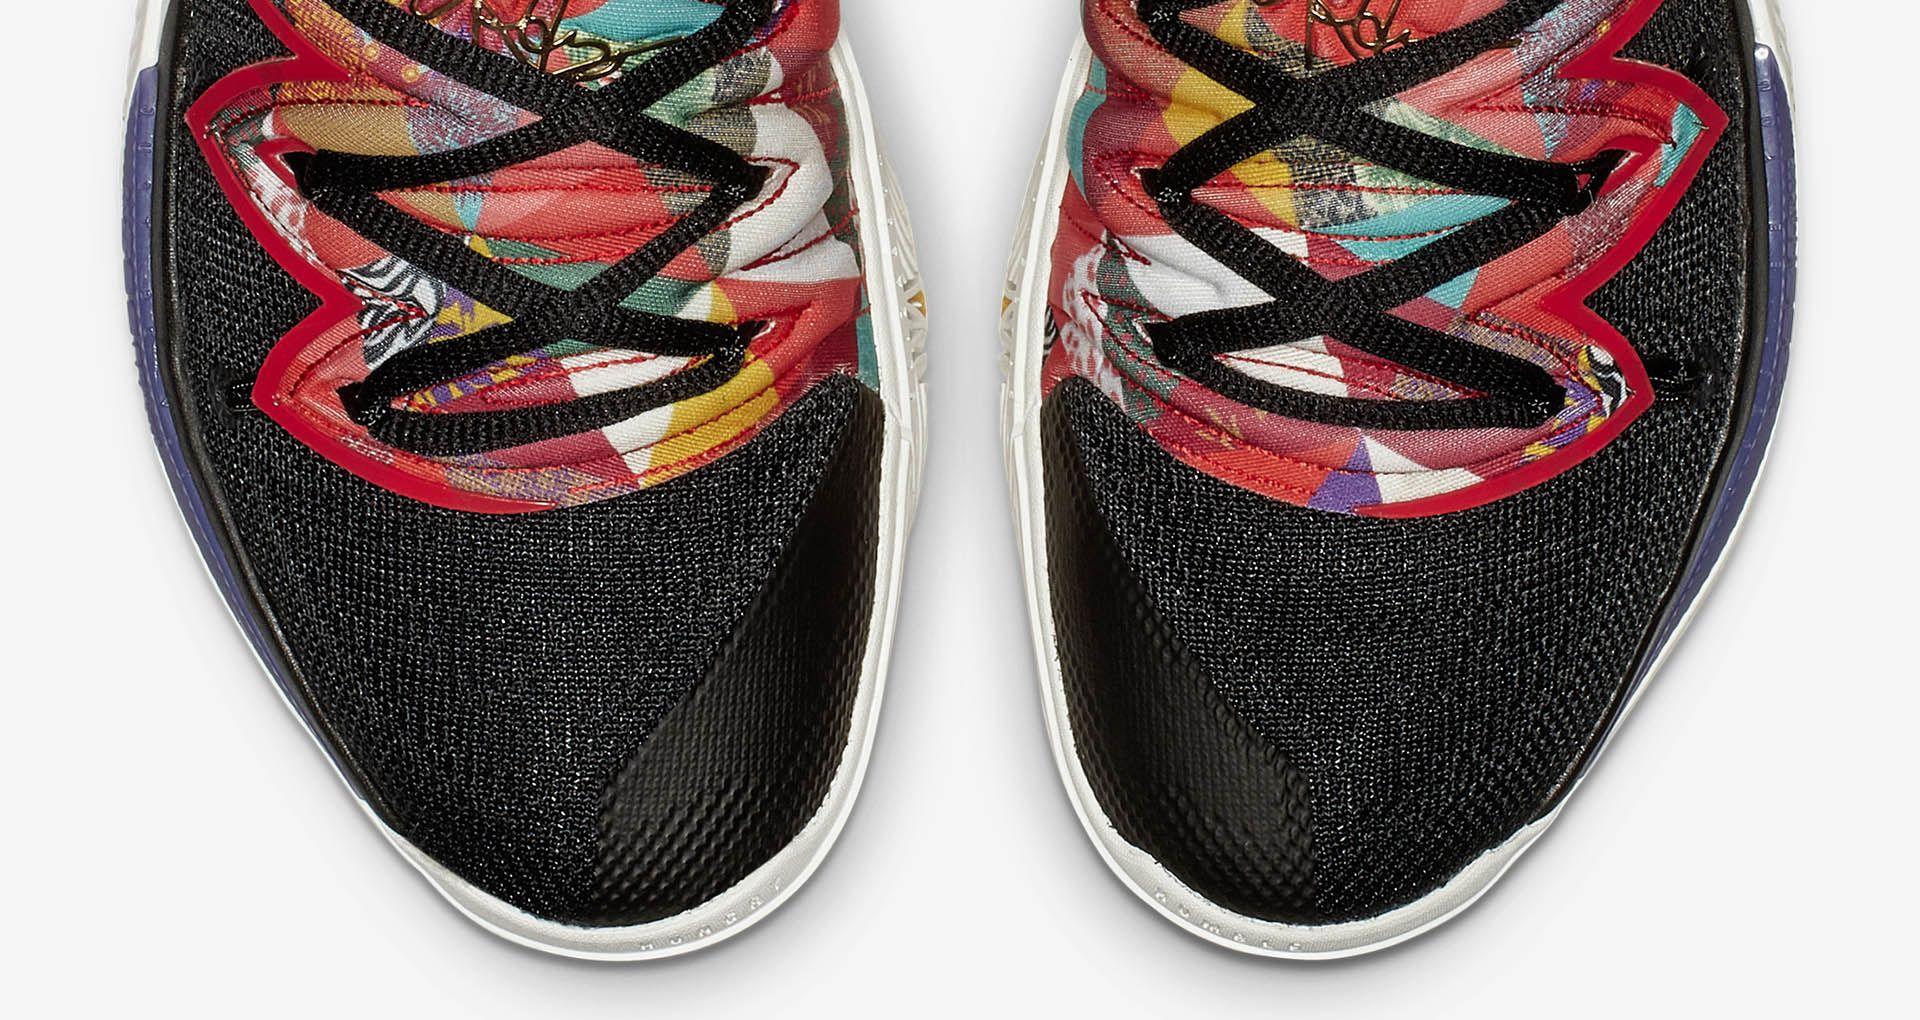 hot sale online b46f5 063f1 Men's Kyrie 5 'CNY' Release Date.. Nike+ SNKRS